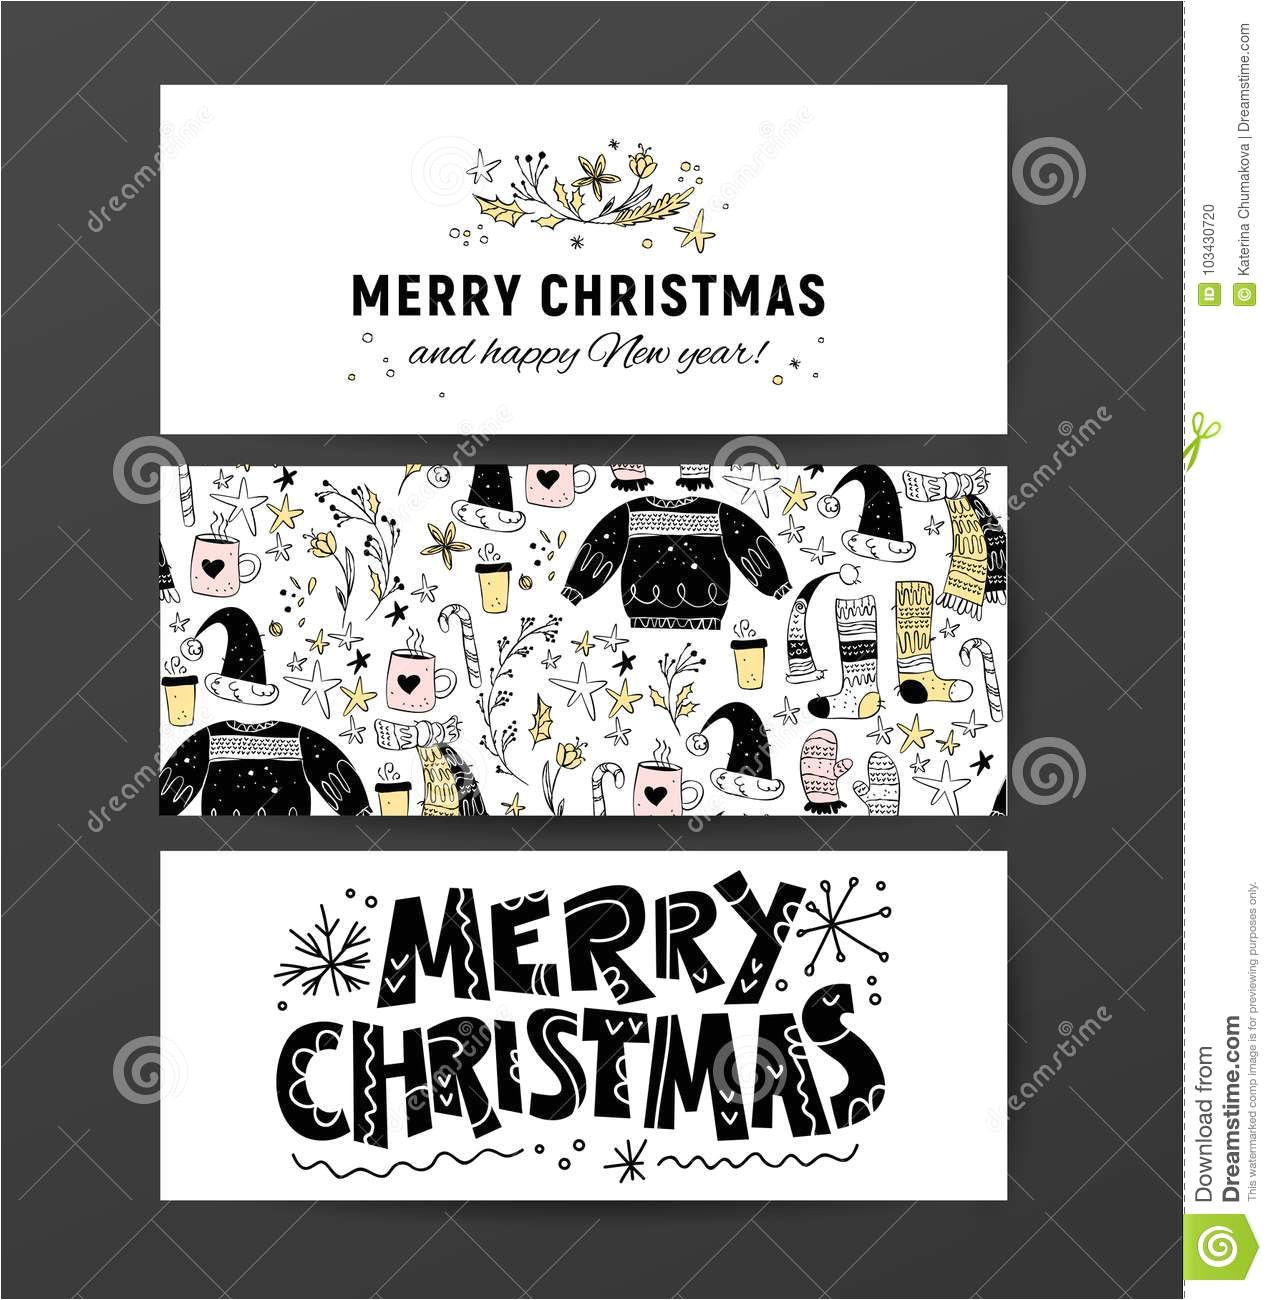 set vector christmas new year congratulation card designs scandinavian style illustration simple cute hand made xmas collection 103430720 jpg